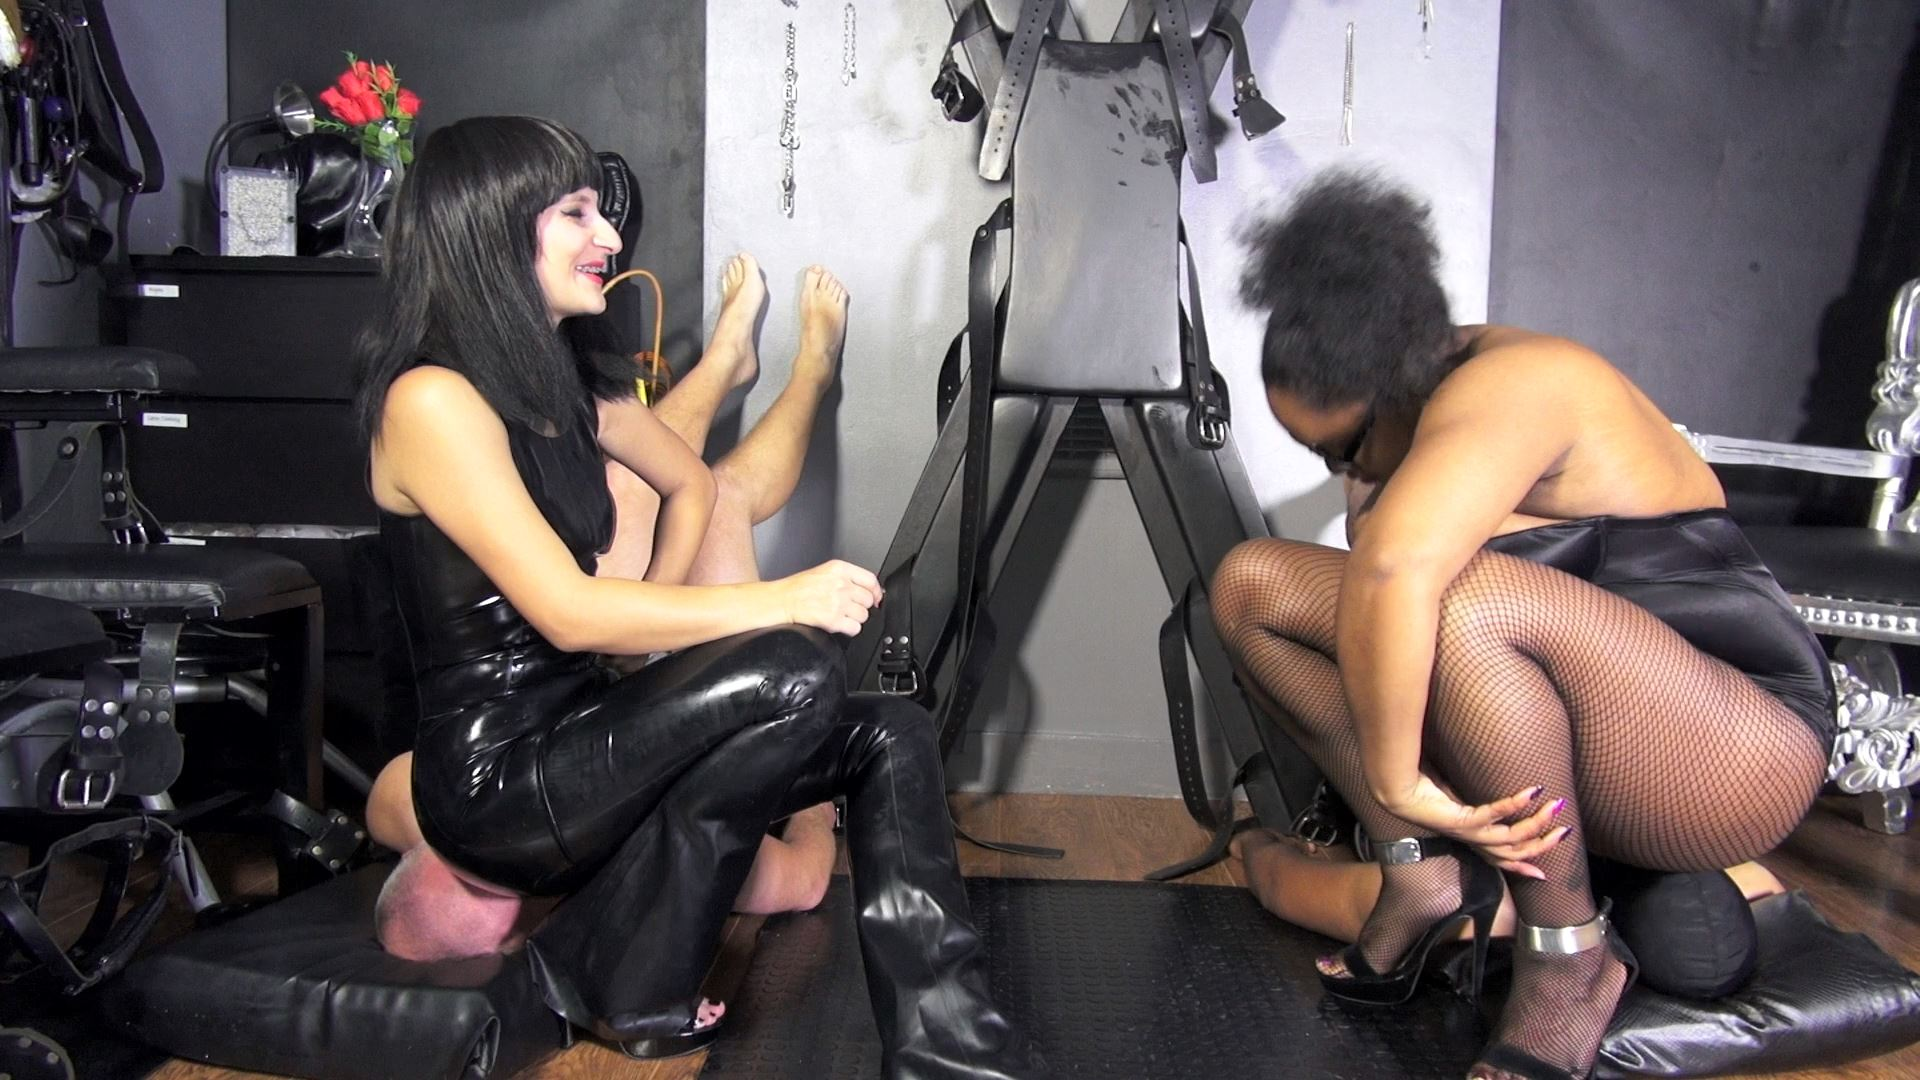 LADY ANDROMEDA, MISS TRESSA In Scene: Human Chairs - BLACK-MISTRESSES - FULL HD/1080p/MP4